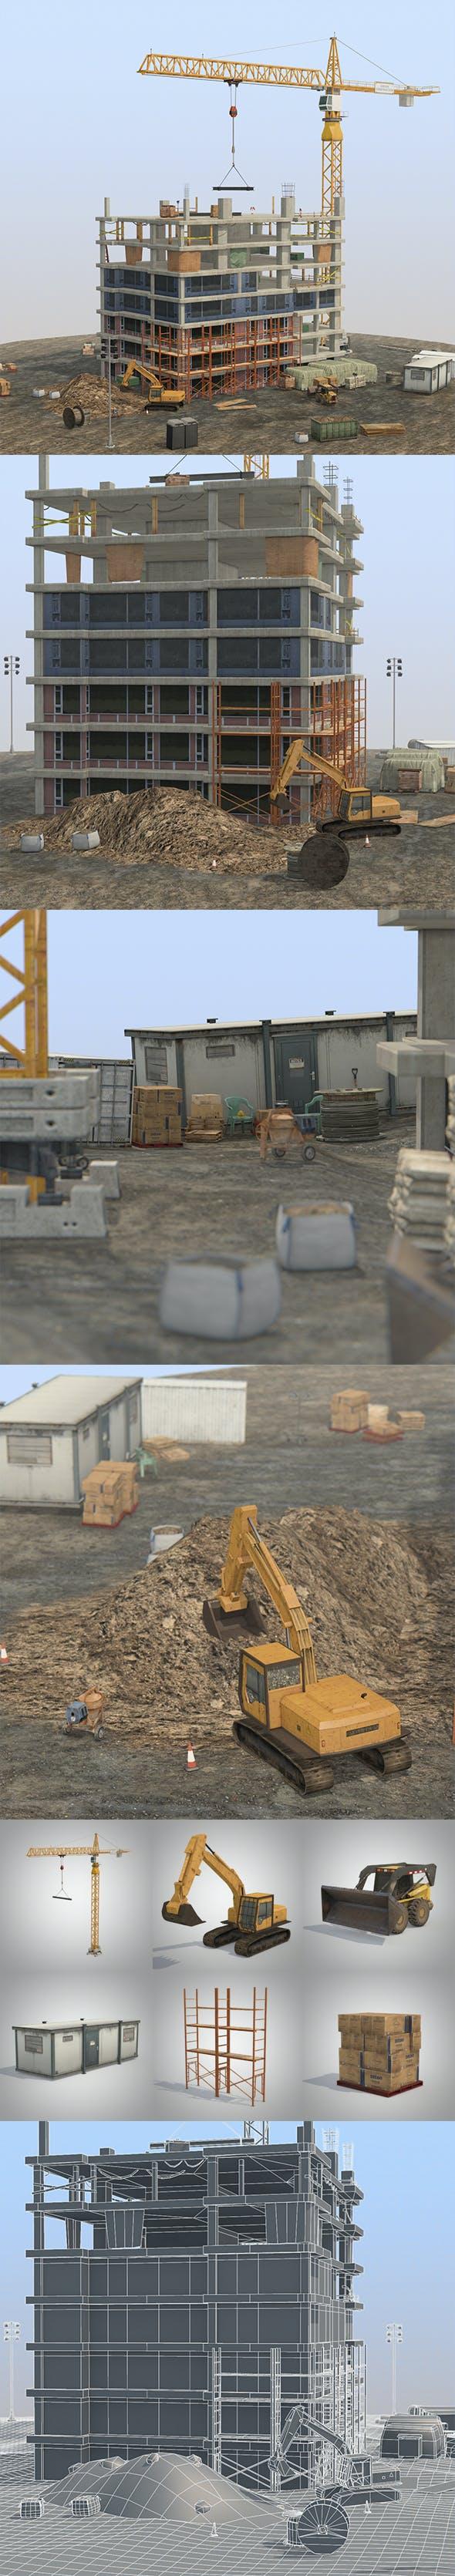 Under Construction Scene Lite Pack - 3DOcean Item for Sale